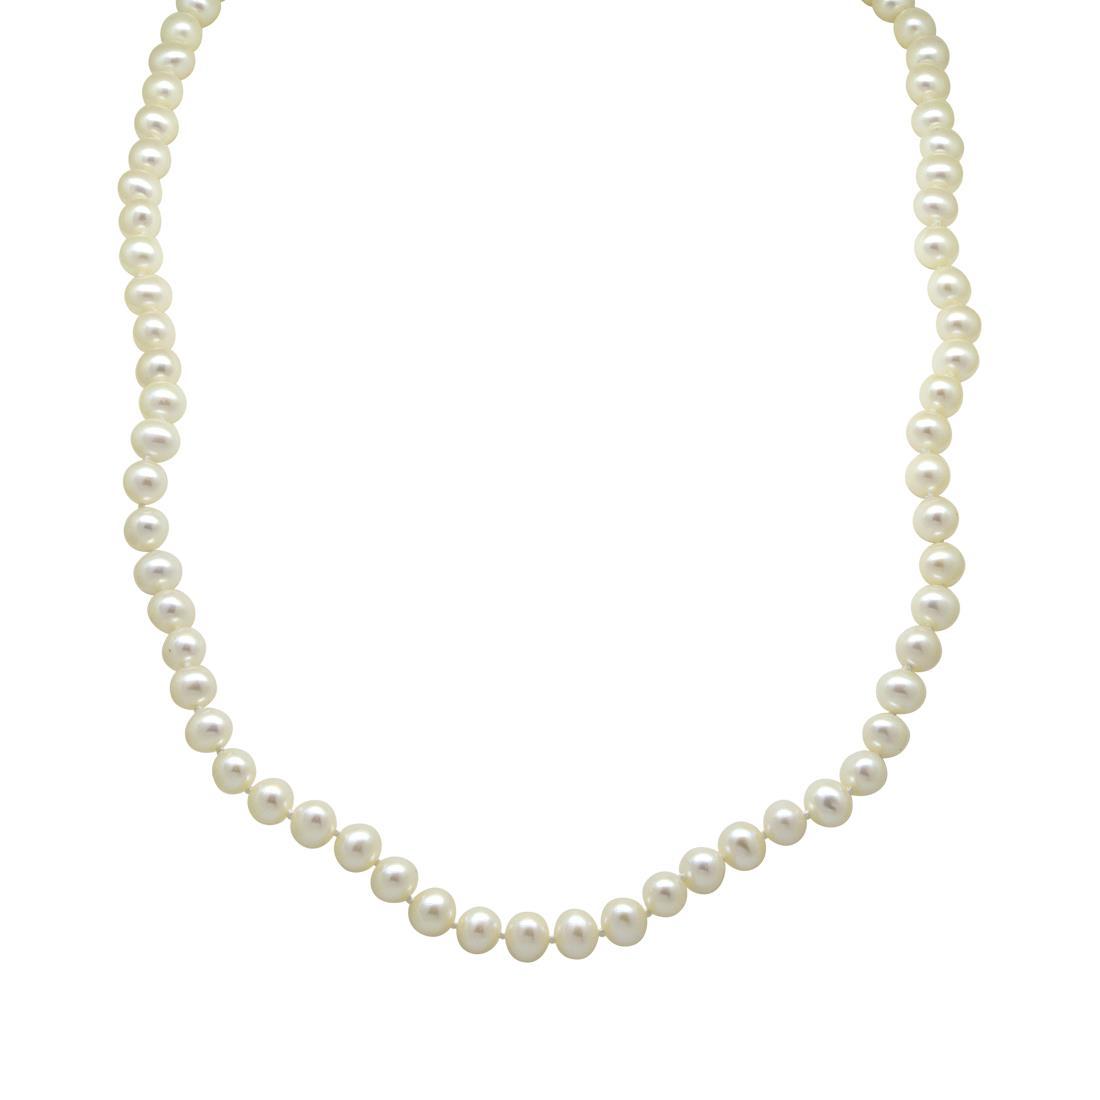 Collana lunga con perle  - RIVIK